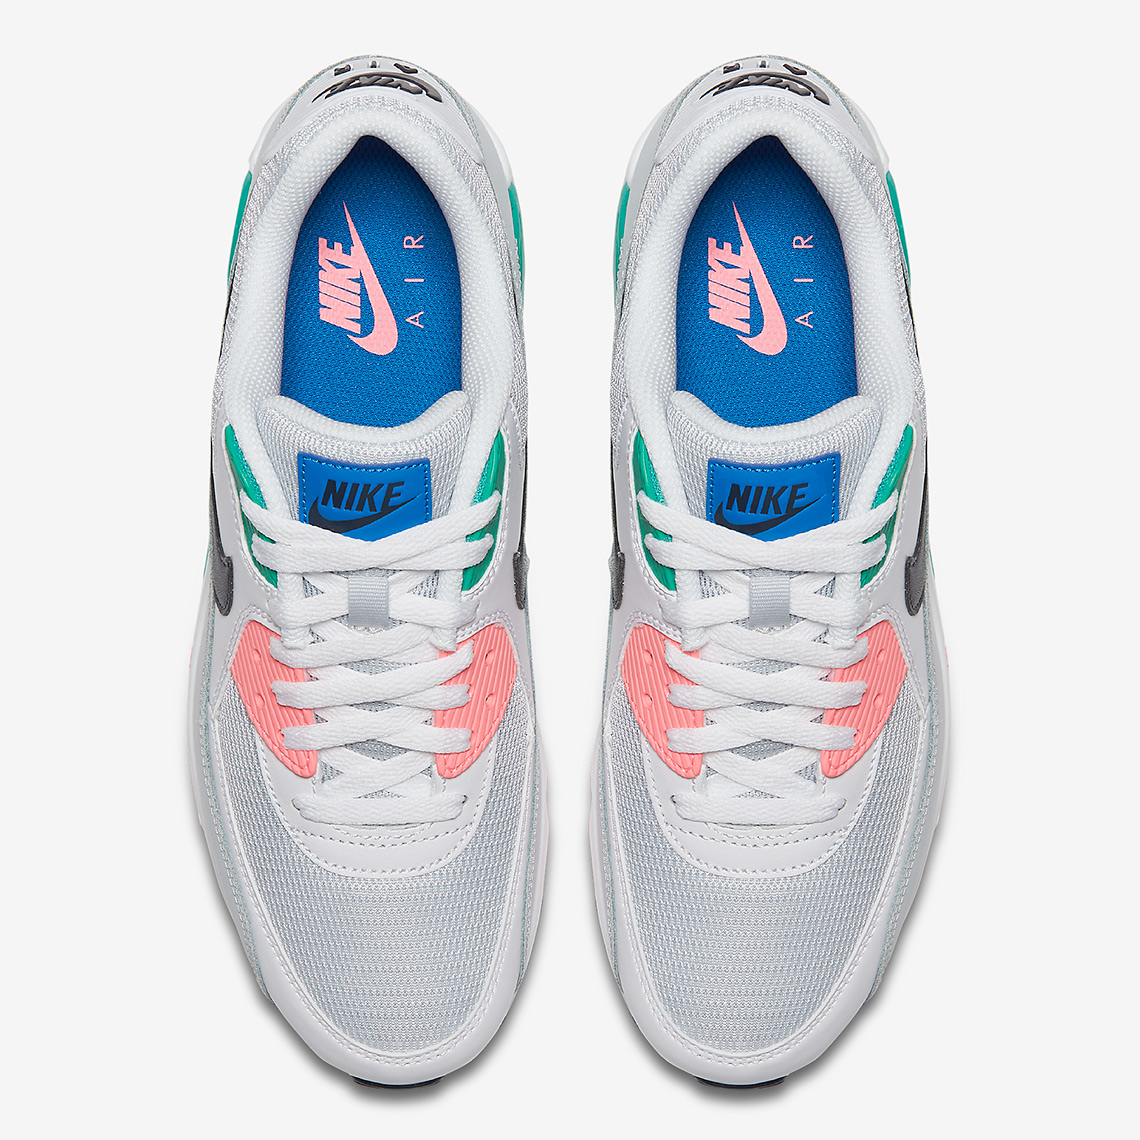 34e0e492d71ea6 ... AJ1285-100 Size  The sale of shoes Nike Air Max 90 Essential Summer Sea  Watermelon South Beach White AJ1285  Best Wholesaler Shop this Article ...